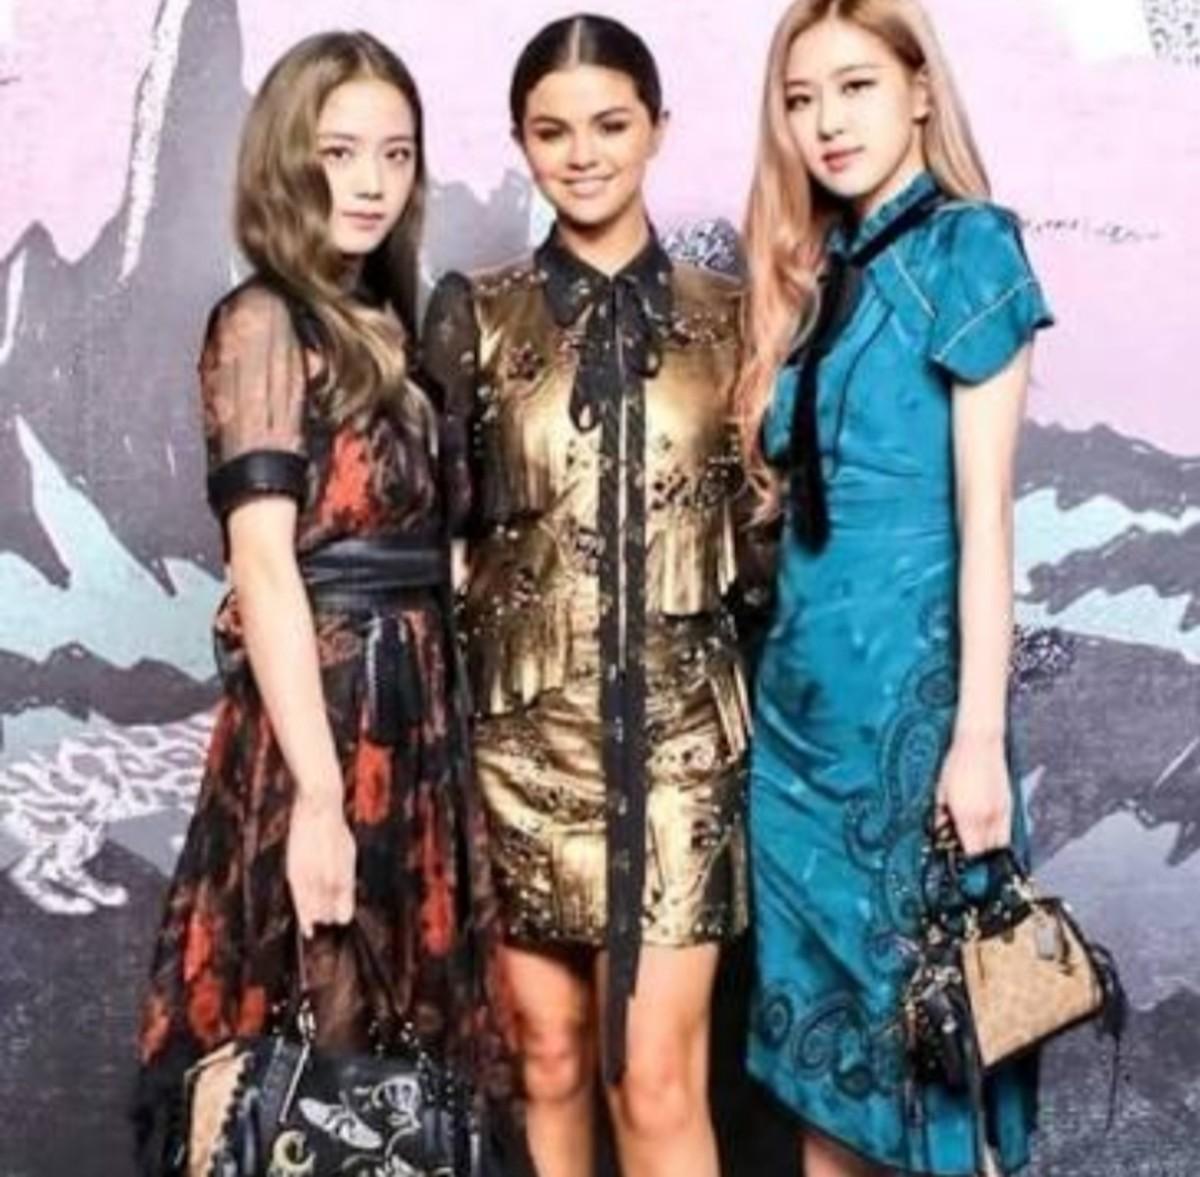 Blackpink and Selena Gomez Collaboration Confirmed,